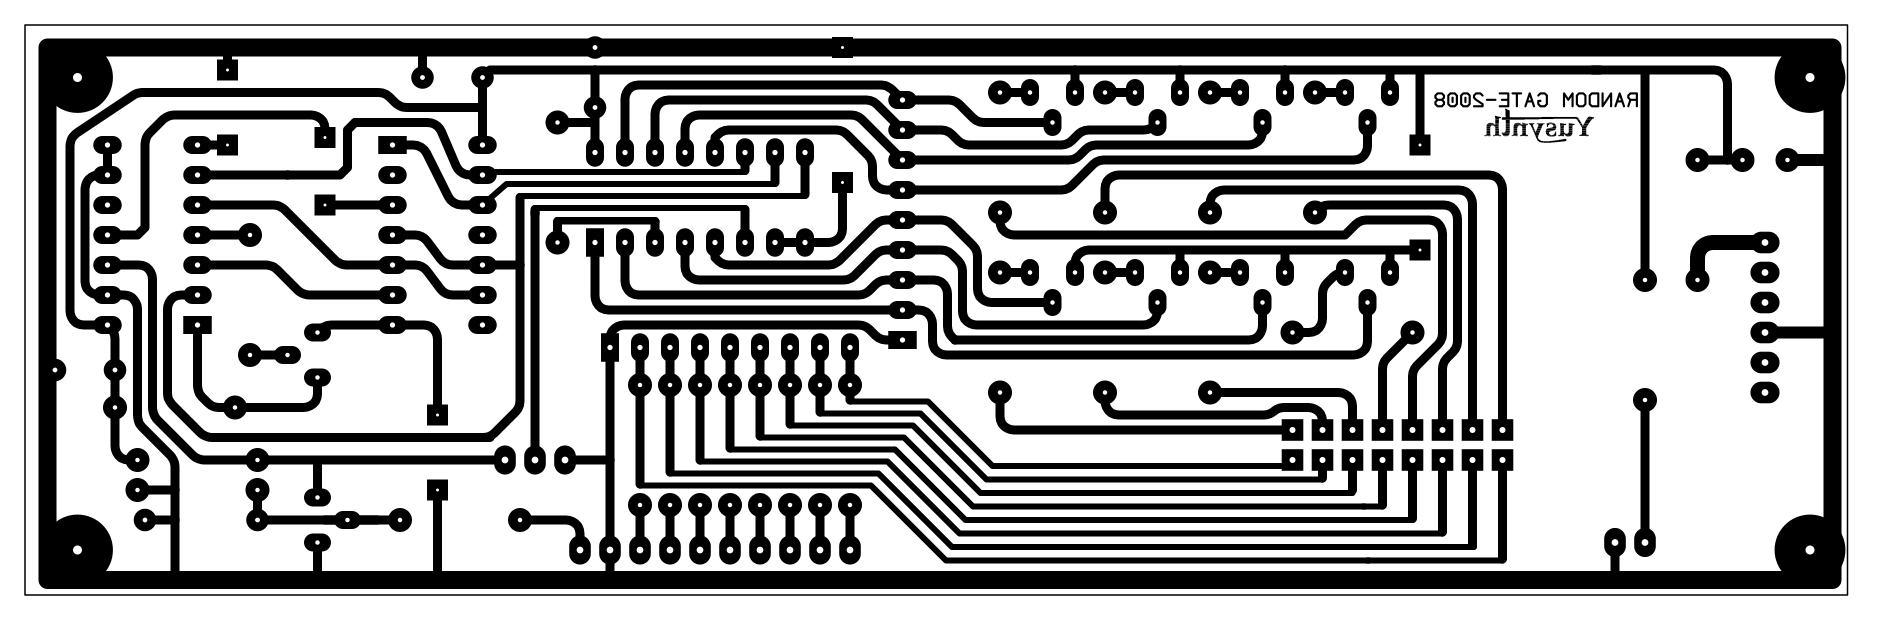 Random Gates Board Design The Pcb Guide Printed Circuit Layout